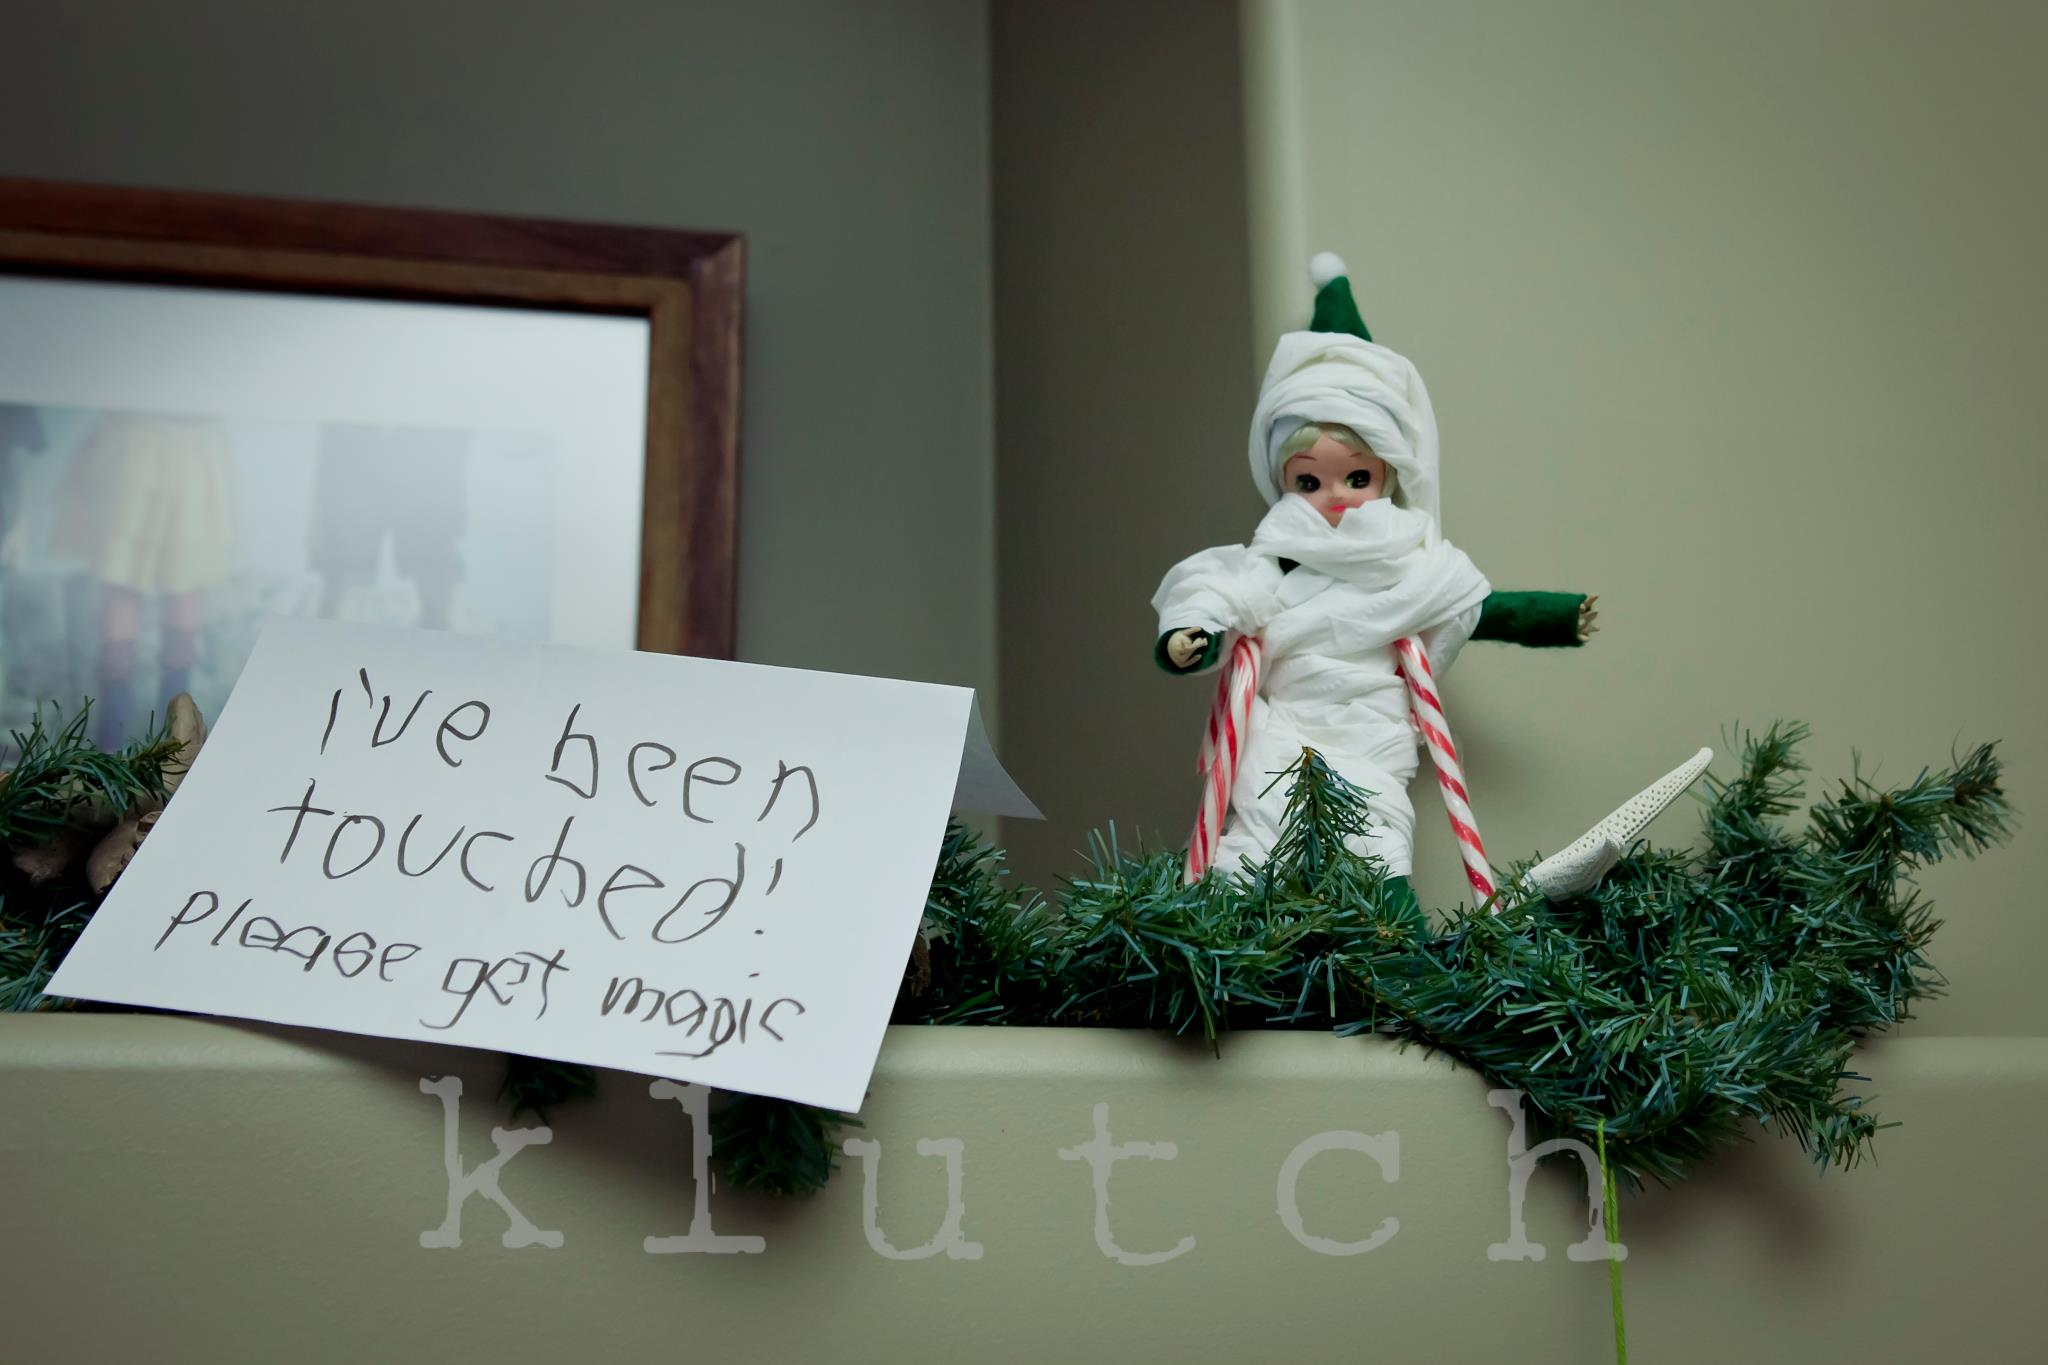 Klutch Photography, family photographer, elf on the shelf, vancouver family photographer, whiterock family photographer, lifeunscripted photographer, lifestlye photographer aaa.jpg